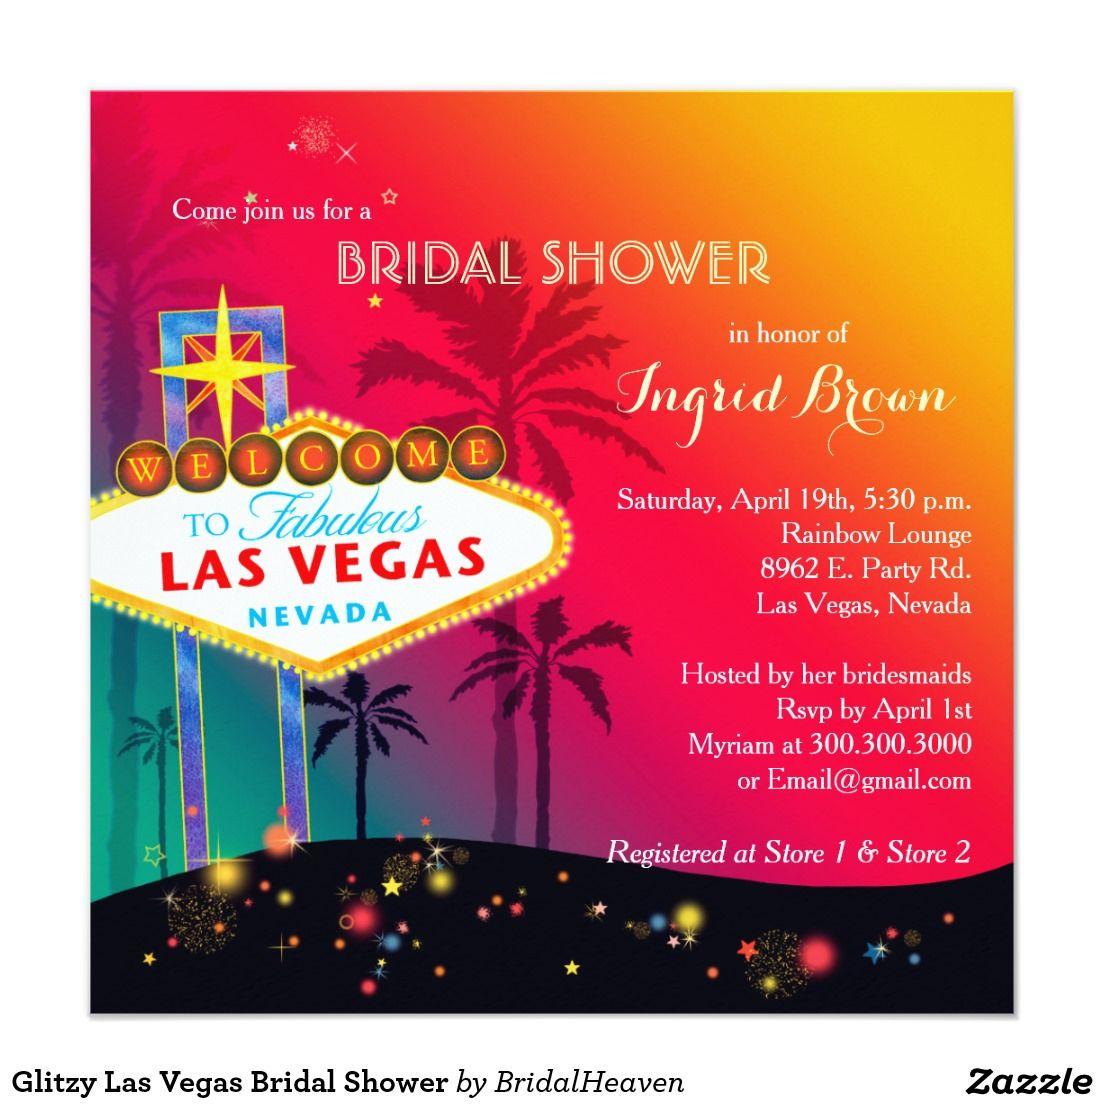 Glitzy Las Vegas Bridal Shower Invitation | Bridal shower cards ...